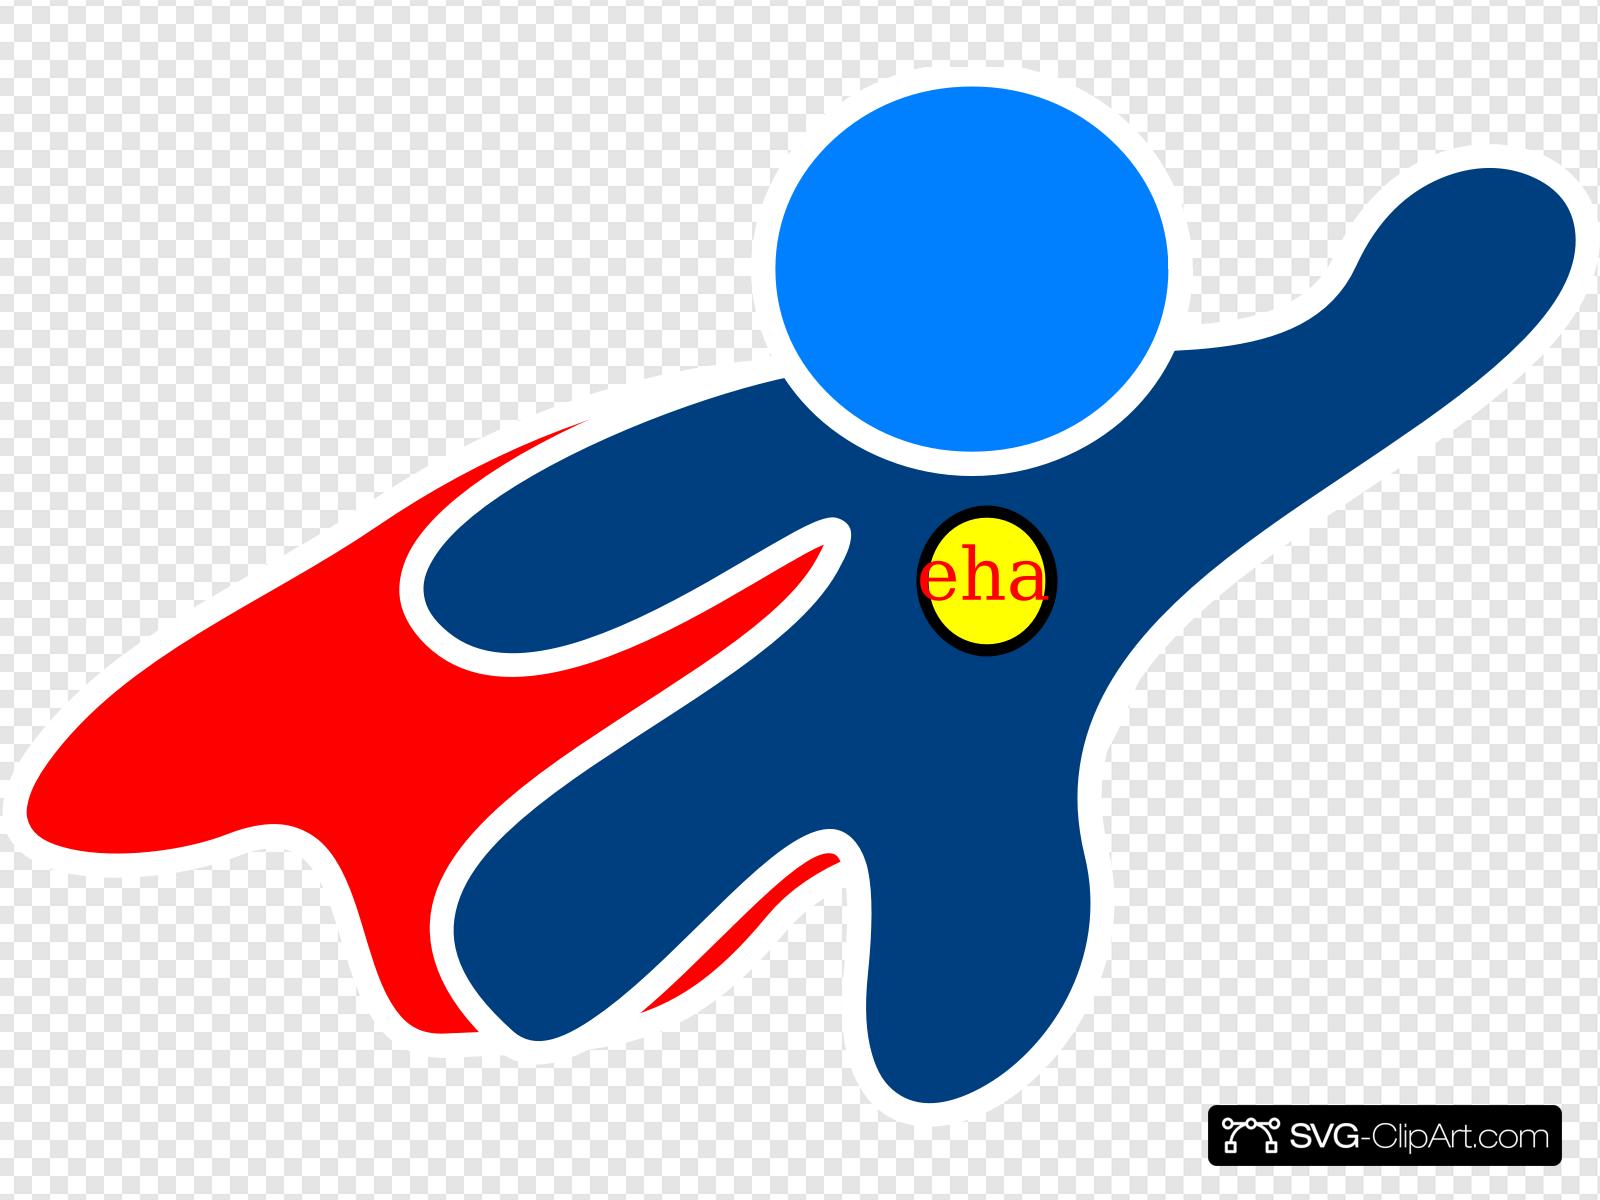 Superhero 1 clipart svg freeuse Superhero 1 By Anne Clip art, Icon and SVG - SVG Clipart svg freeuse